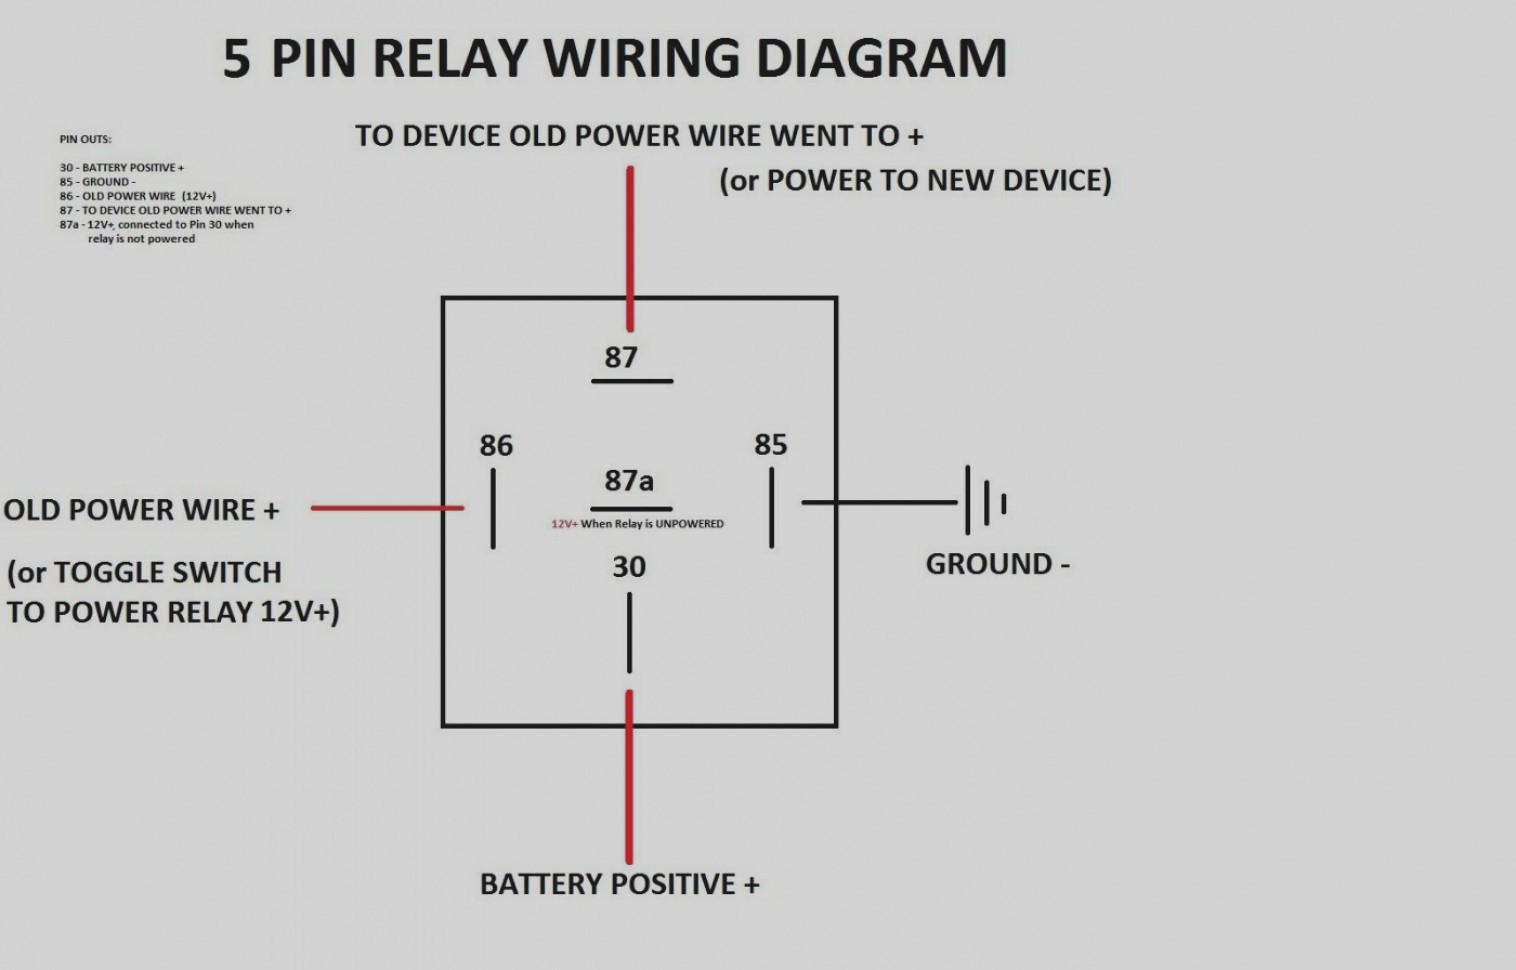 Diagram  5 Pin Relay Wiring Diagram Driving Lights U2014 Untpikapps Wiring Diagram Full Version